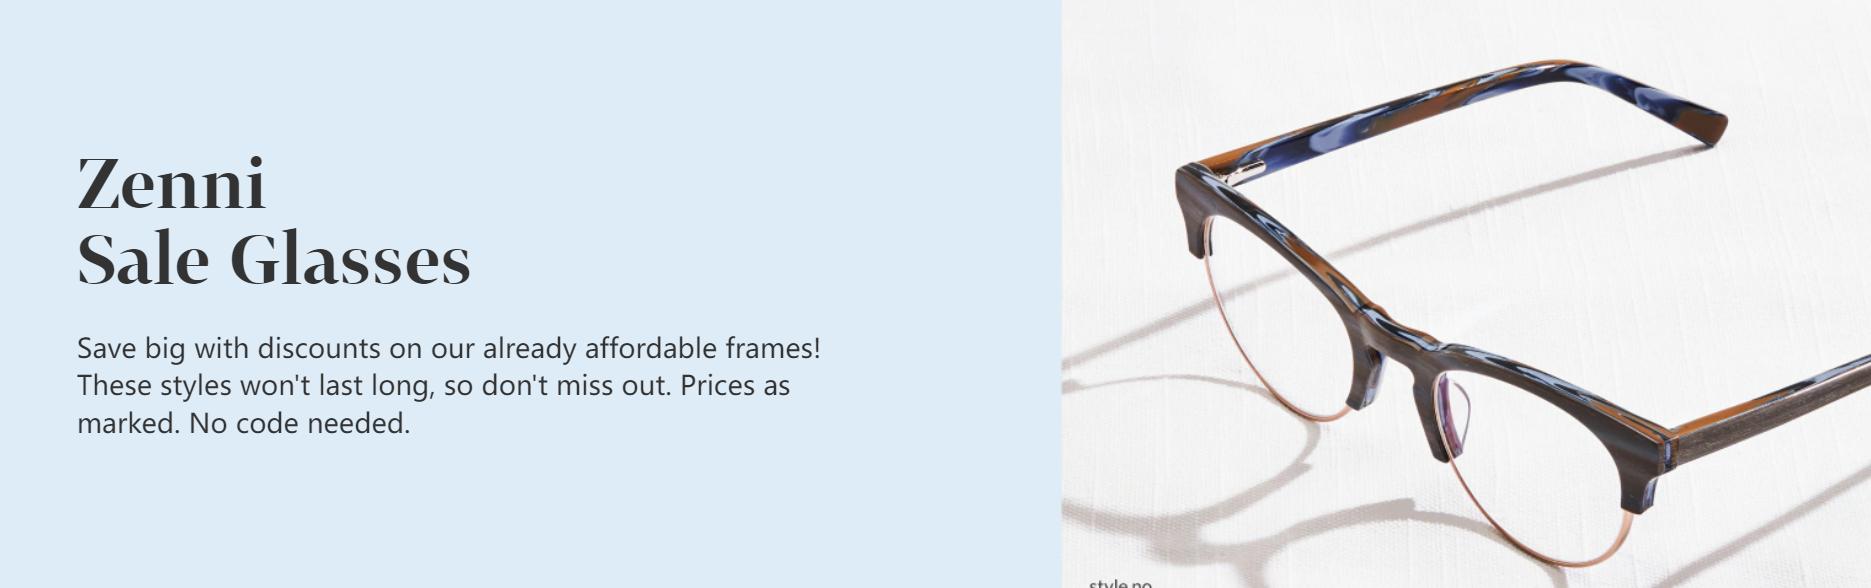 Zenni Optical Promo Codes